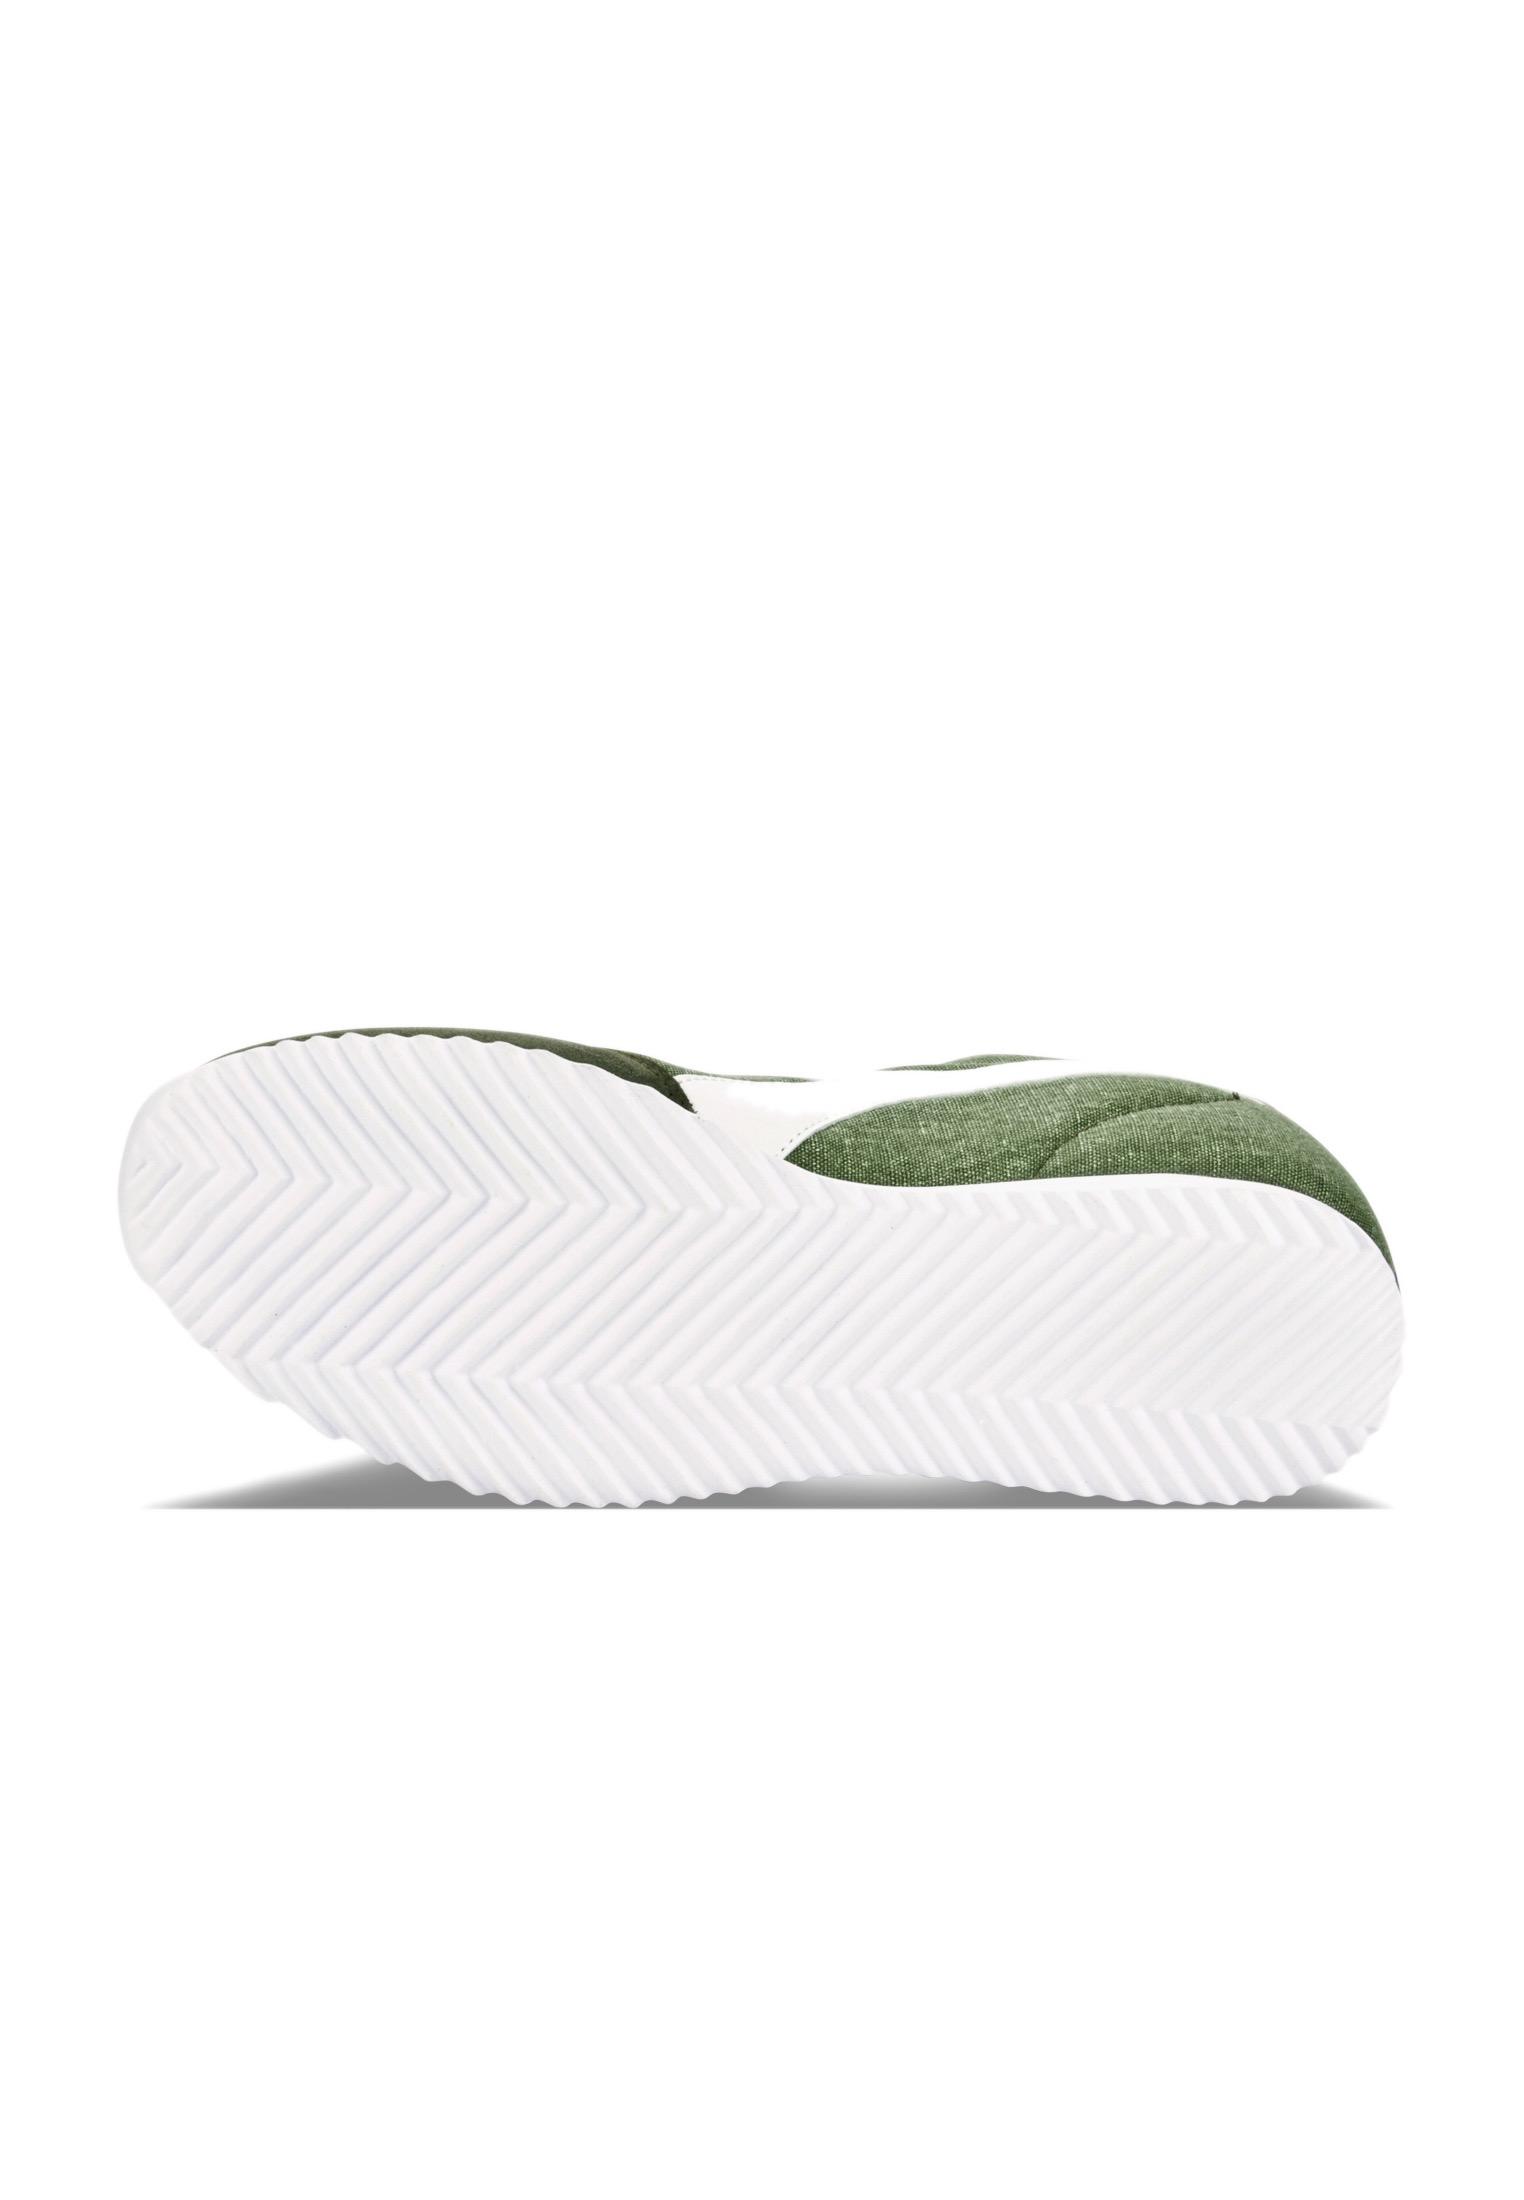 Scarpe-Diadora-Jog-Light-C-Sneakers-sportive-uomo-donna-vari-colori-e-taglie miniatura 45